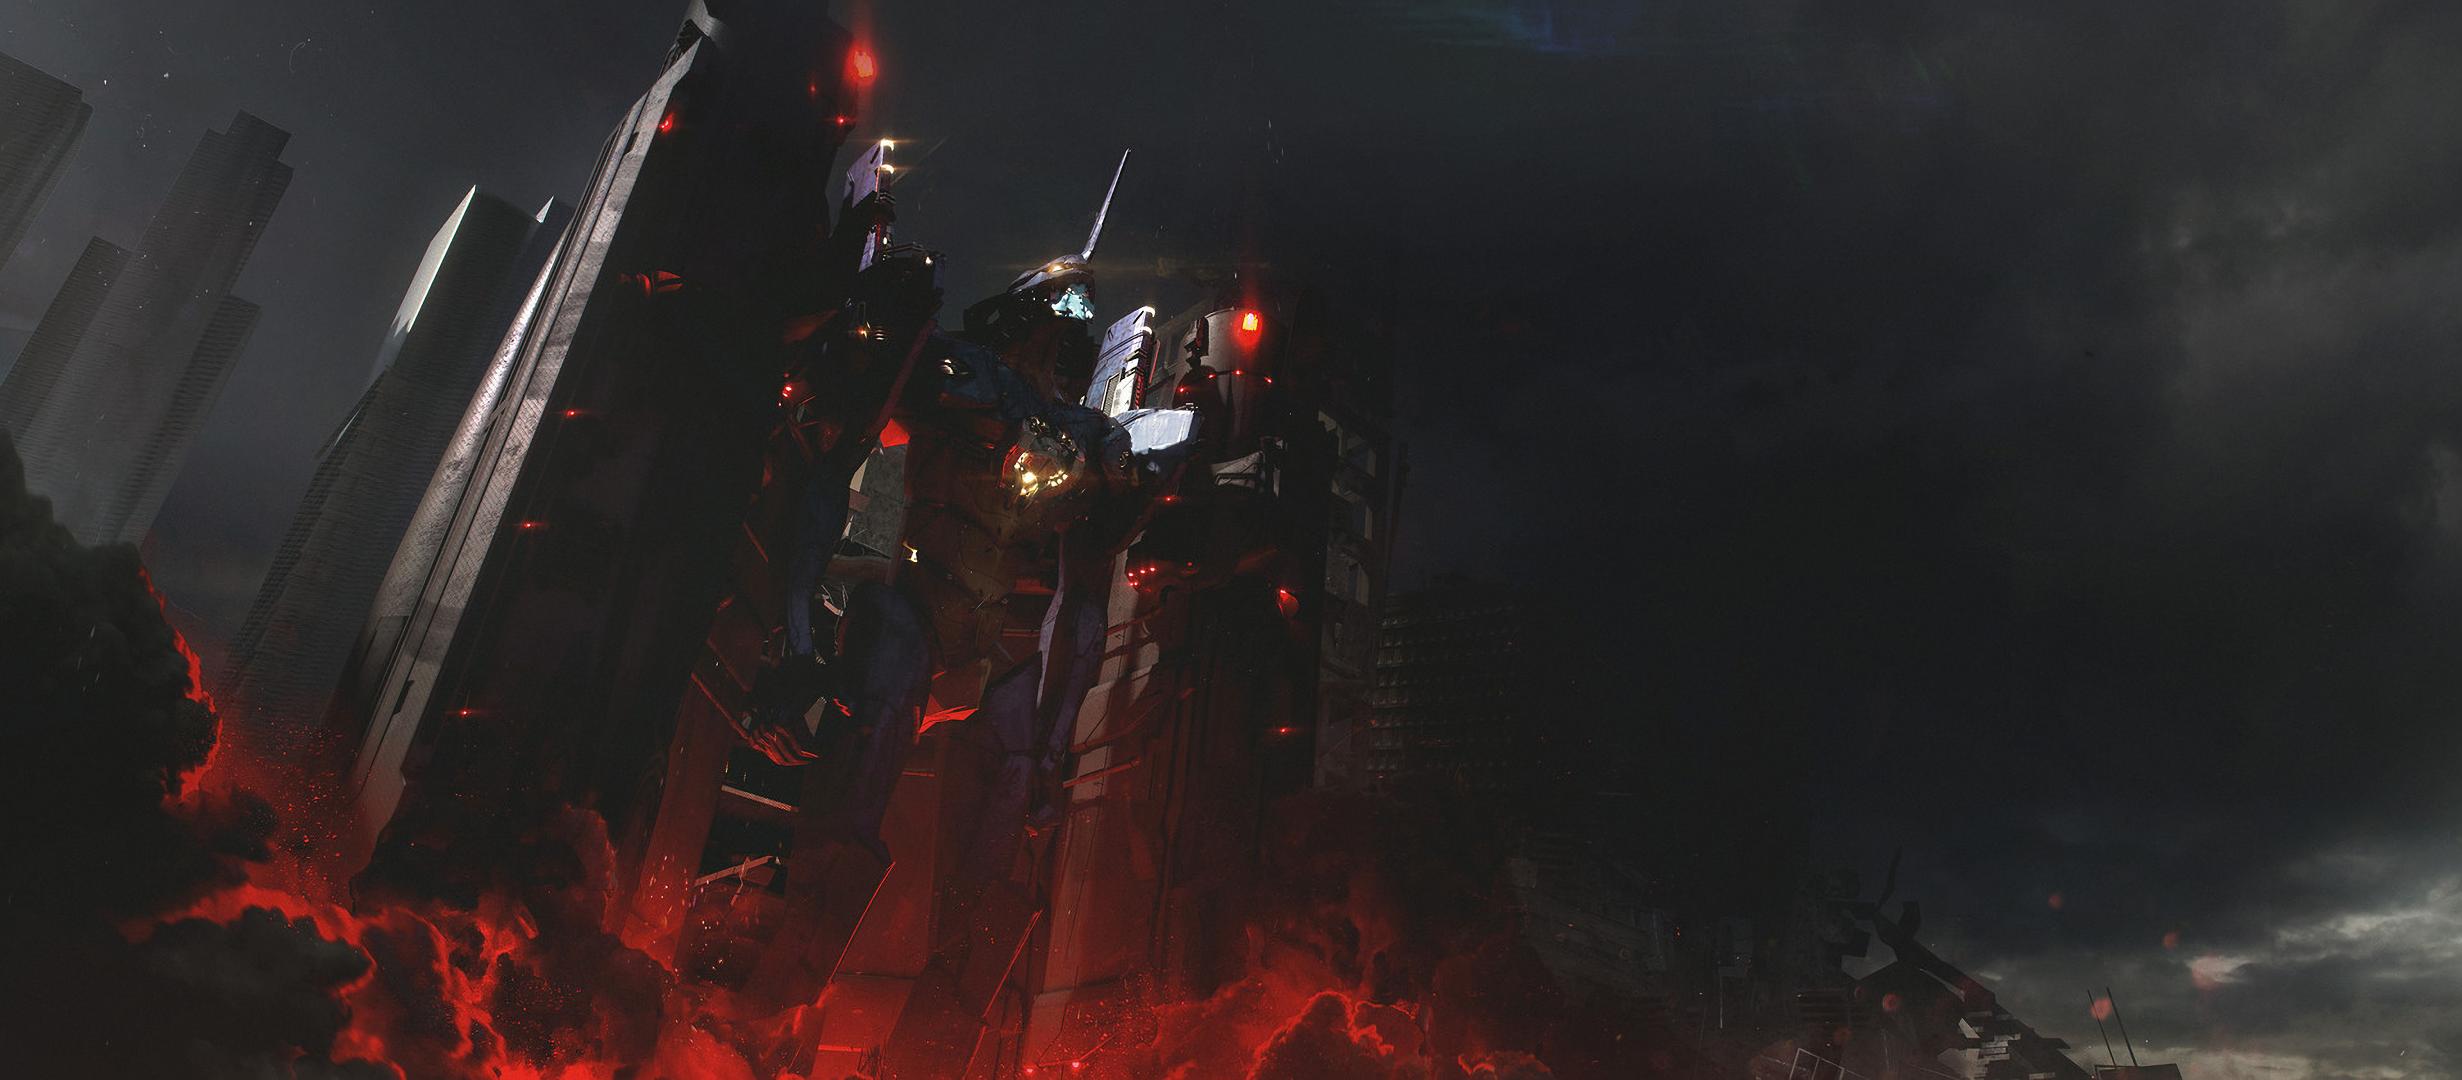 Neon Genesis Evangelion Full HD Wallpaper And Background Image